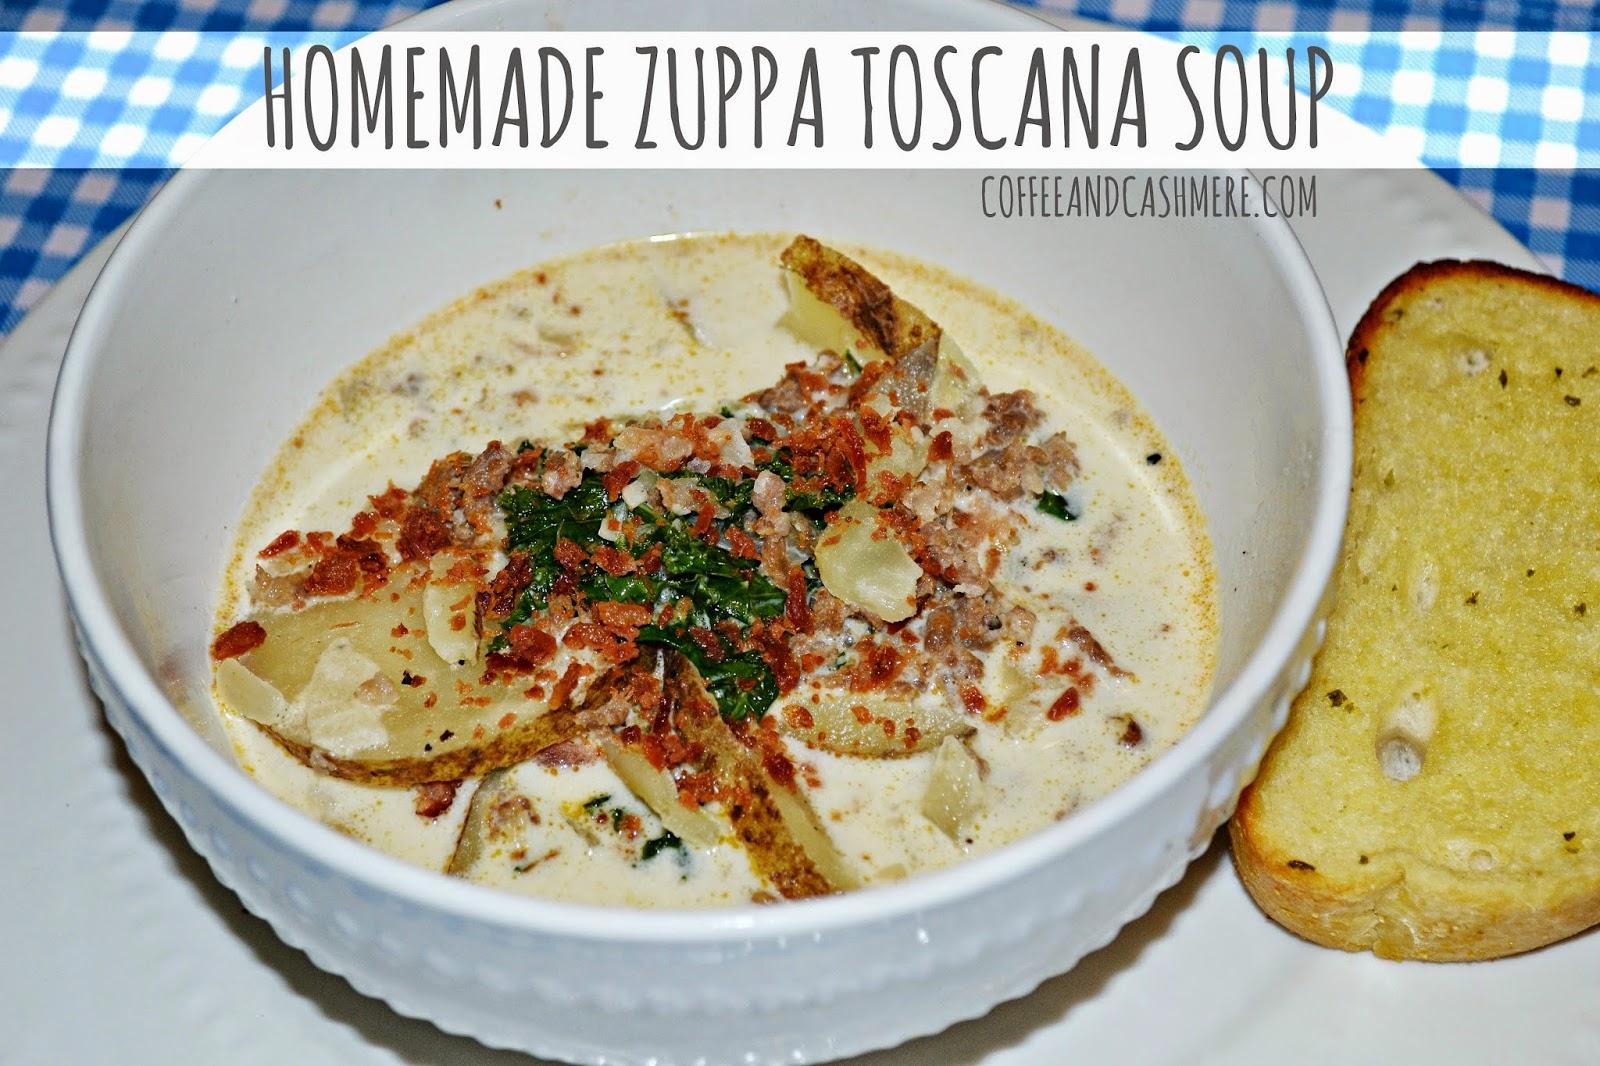 Coffee and Cashmere: Zuppa Toscana